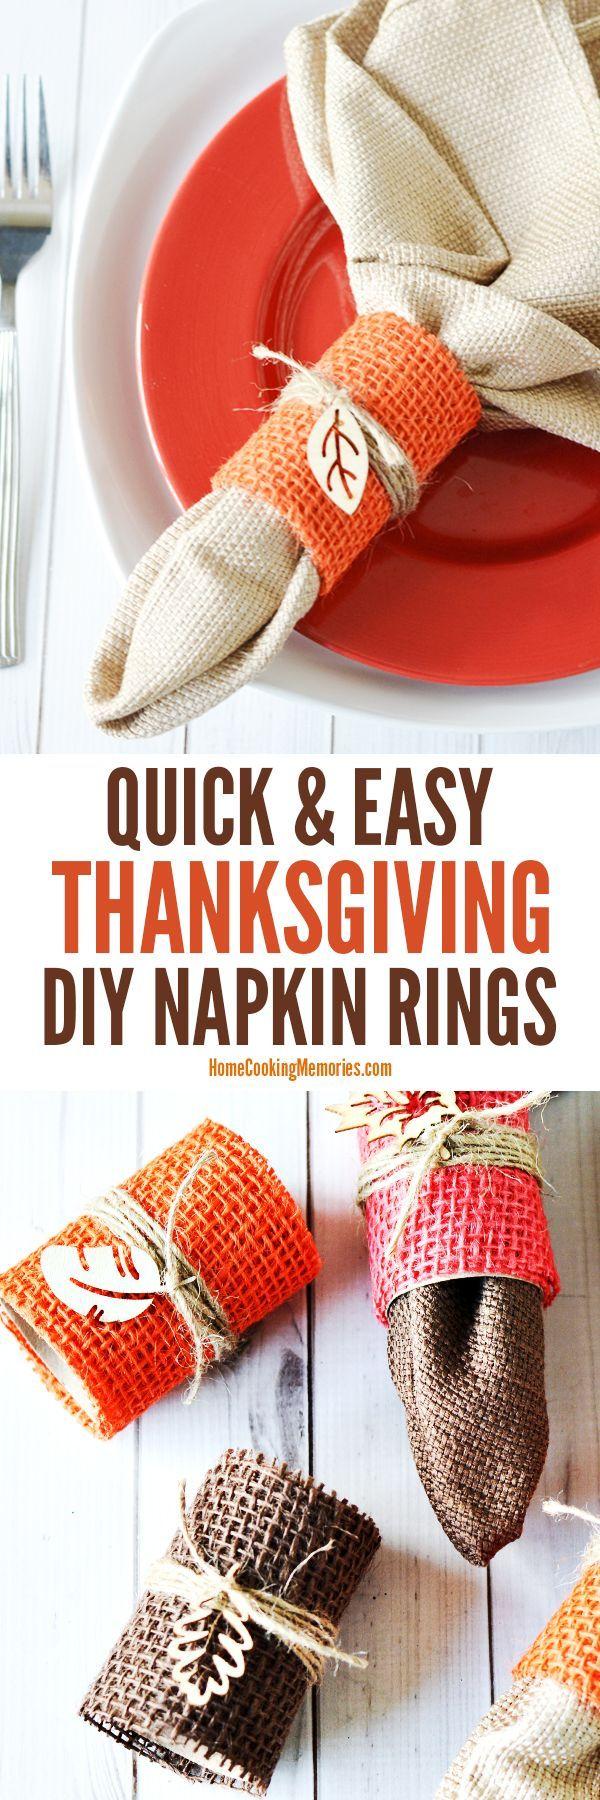 Easy DIY Thanksgiving Napkin Rings Tutorial